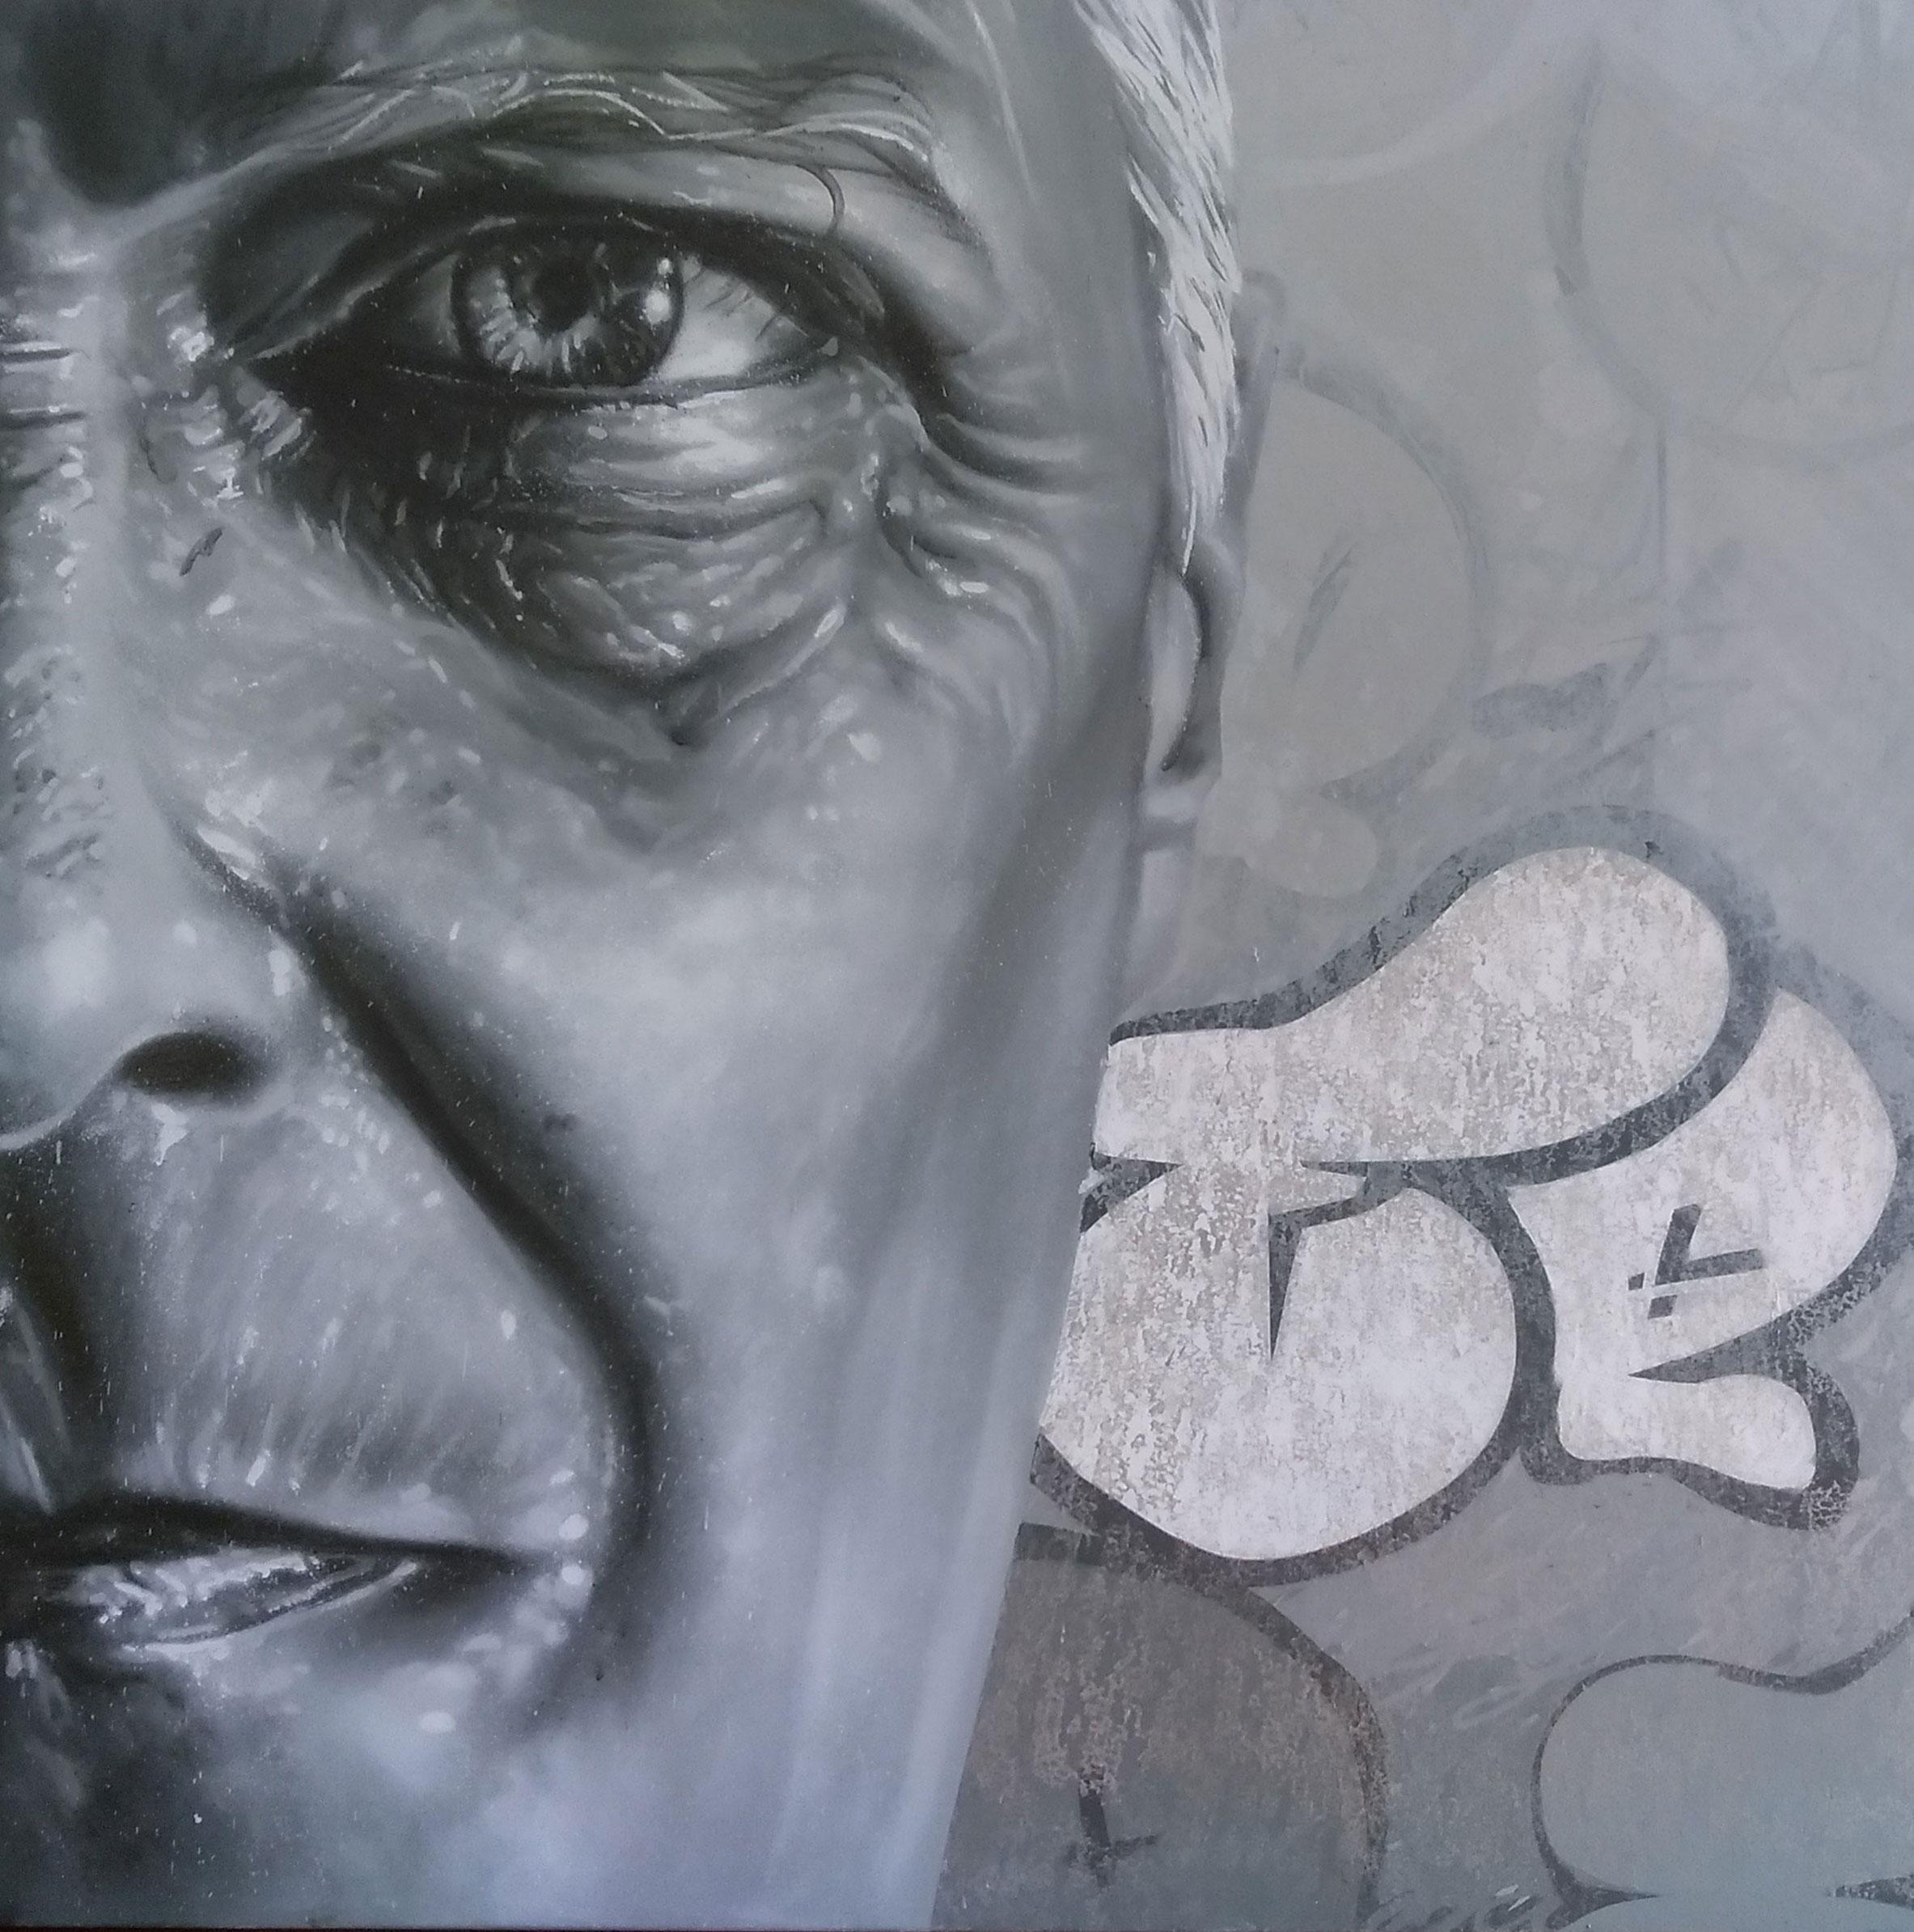 Believe artwork by Kyn Graff - art listed for sale on Artplode